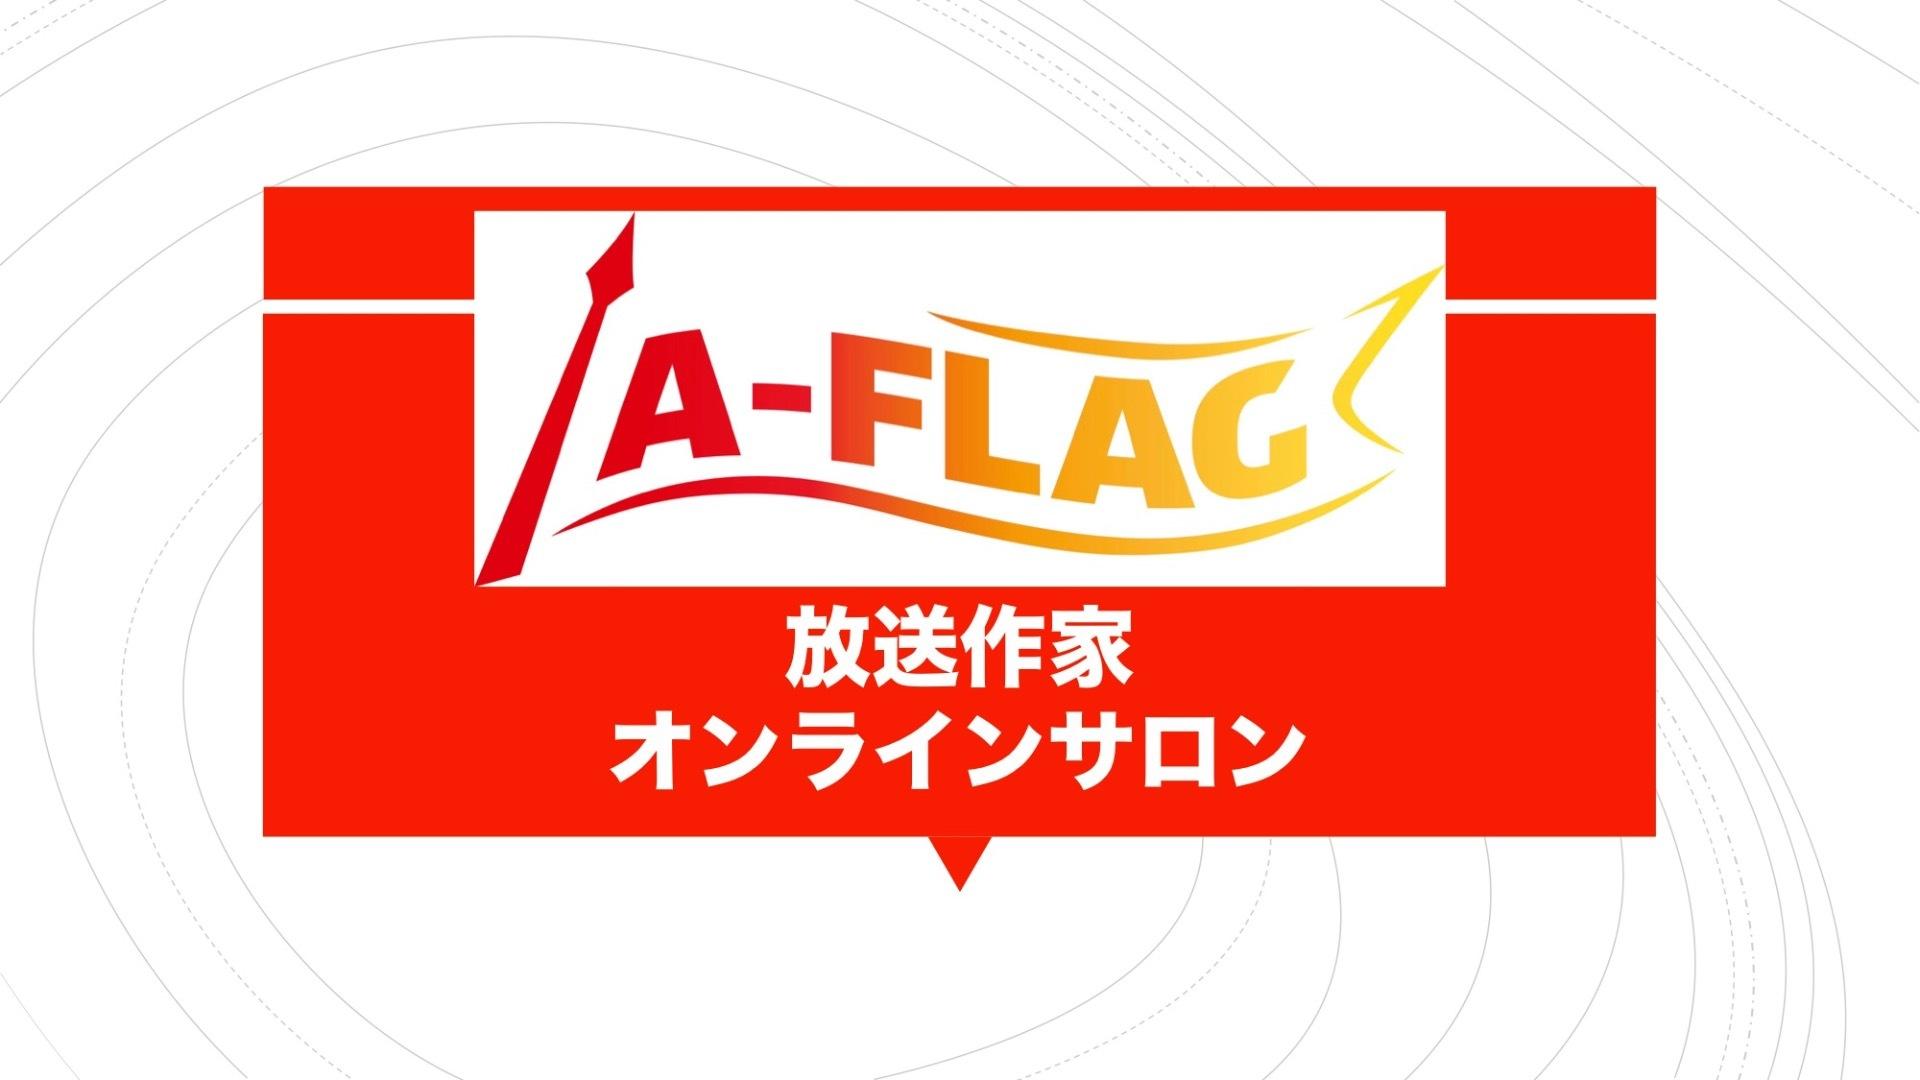 A-FLAG